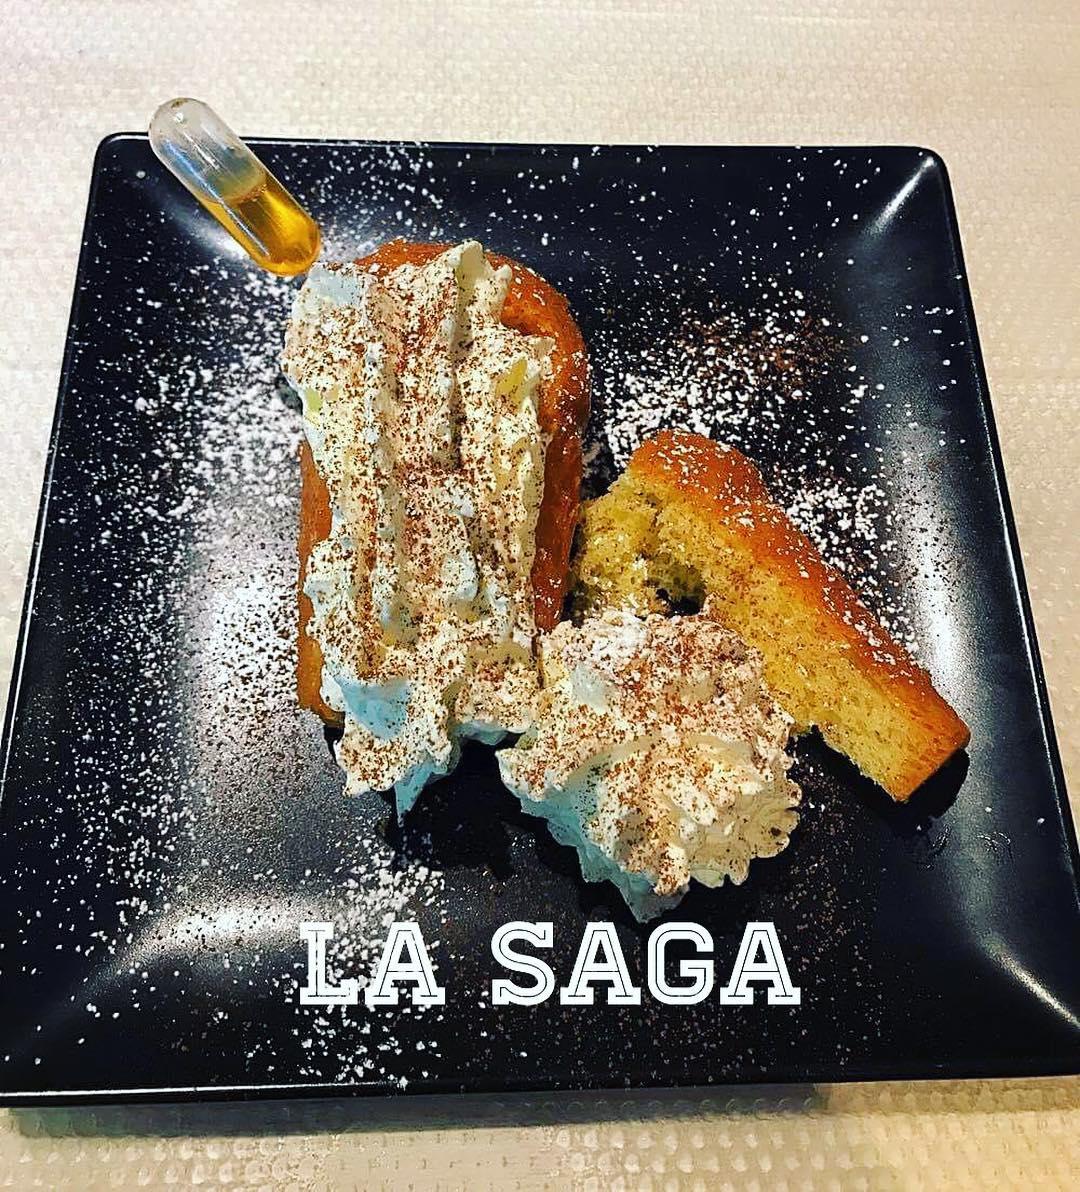 baba-au-rhum-restaurant-pizzeria-la-saga-carqueiranne